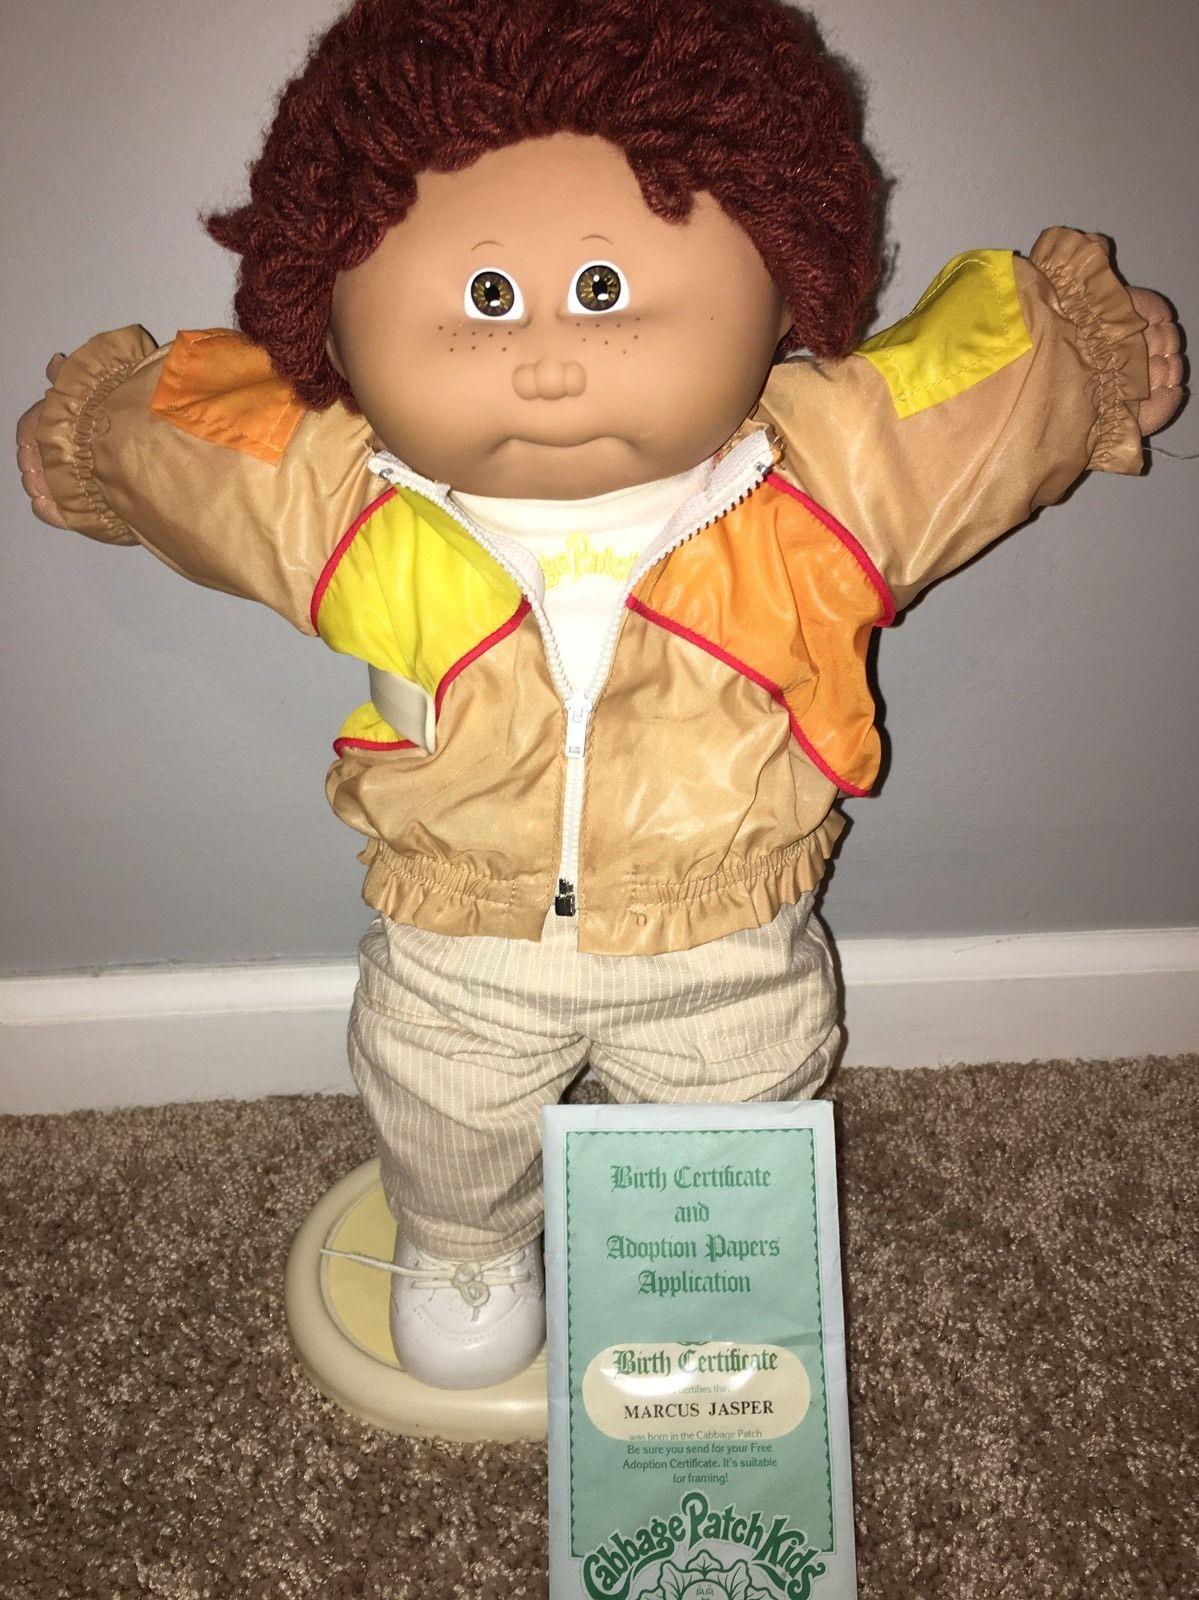 MARCUS JASPER Vintage 1980s Coleco Cabbage Patch Kids Doll Boy HM1 Freckles  | Cabbage patch kids dolls, Cabbage patch kids, Cabbage patch kids boy